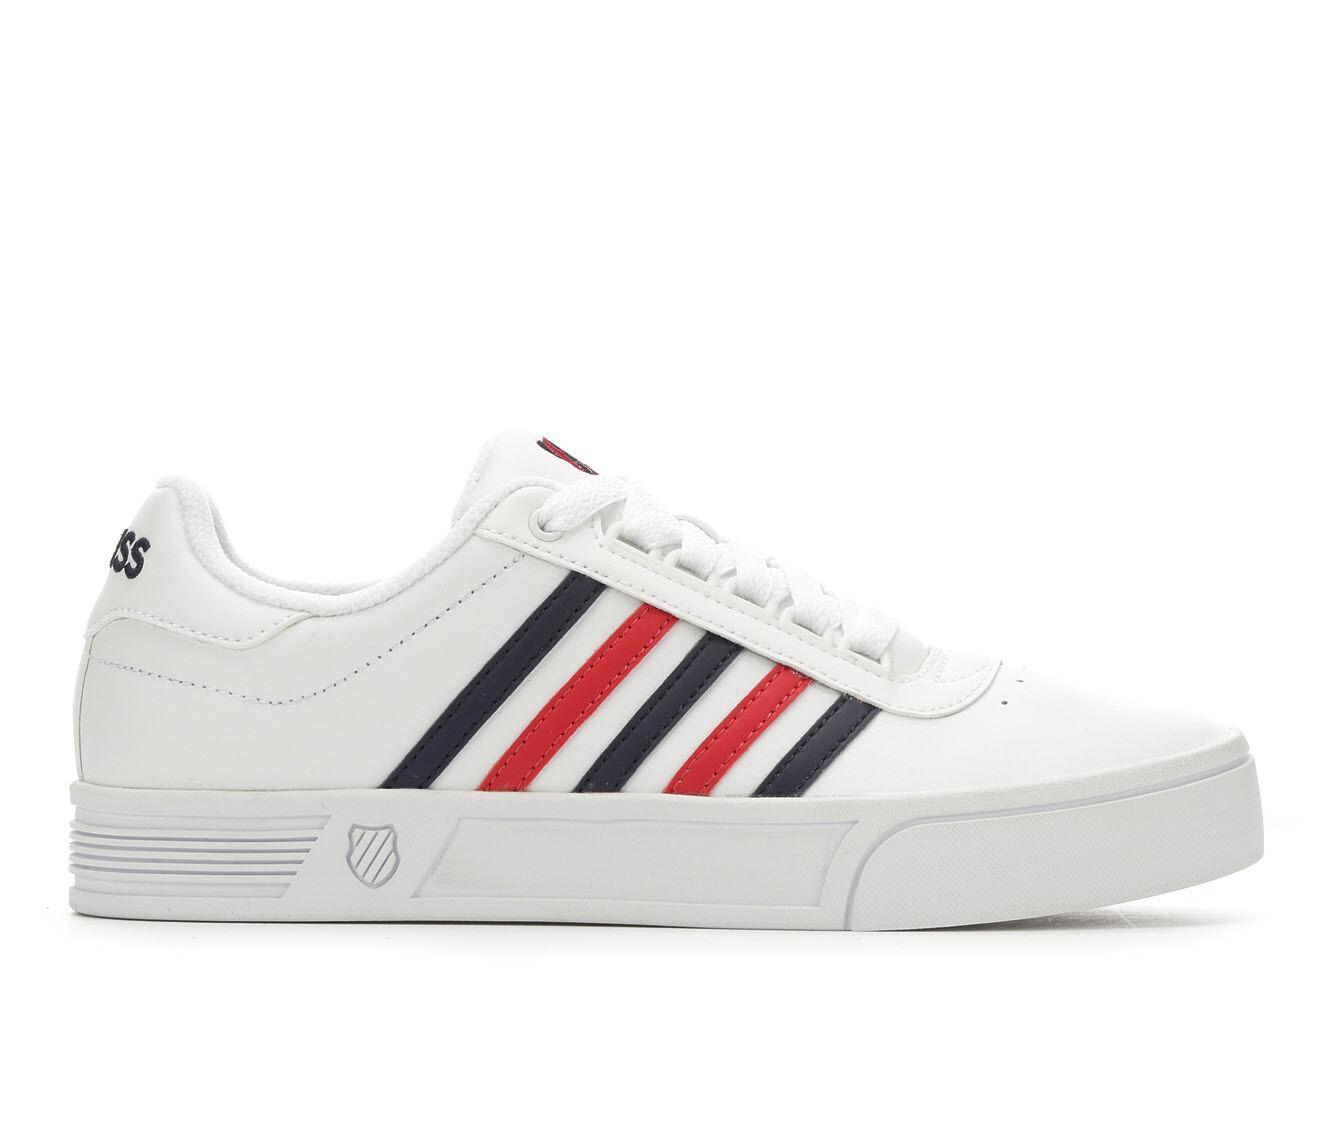 summer hot sale Women's K-Swiss Court Lite Stripes Tennis Shoes White/Red/Blue